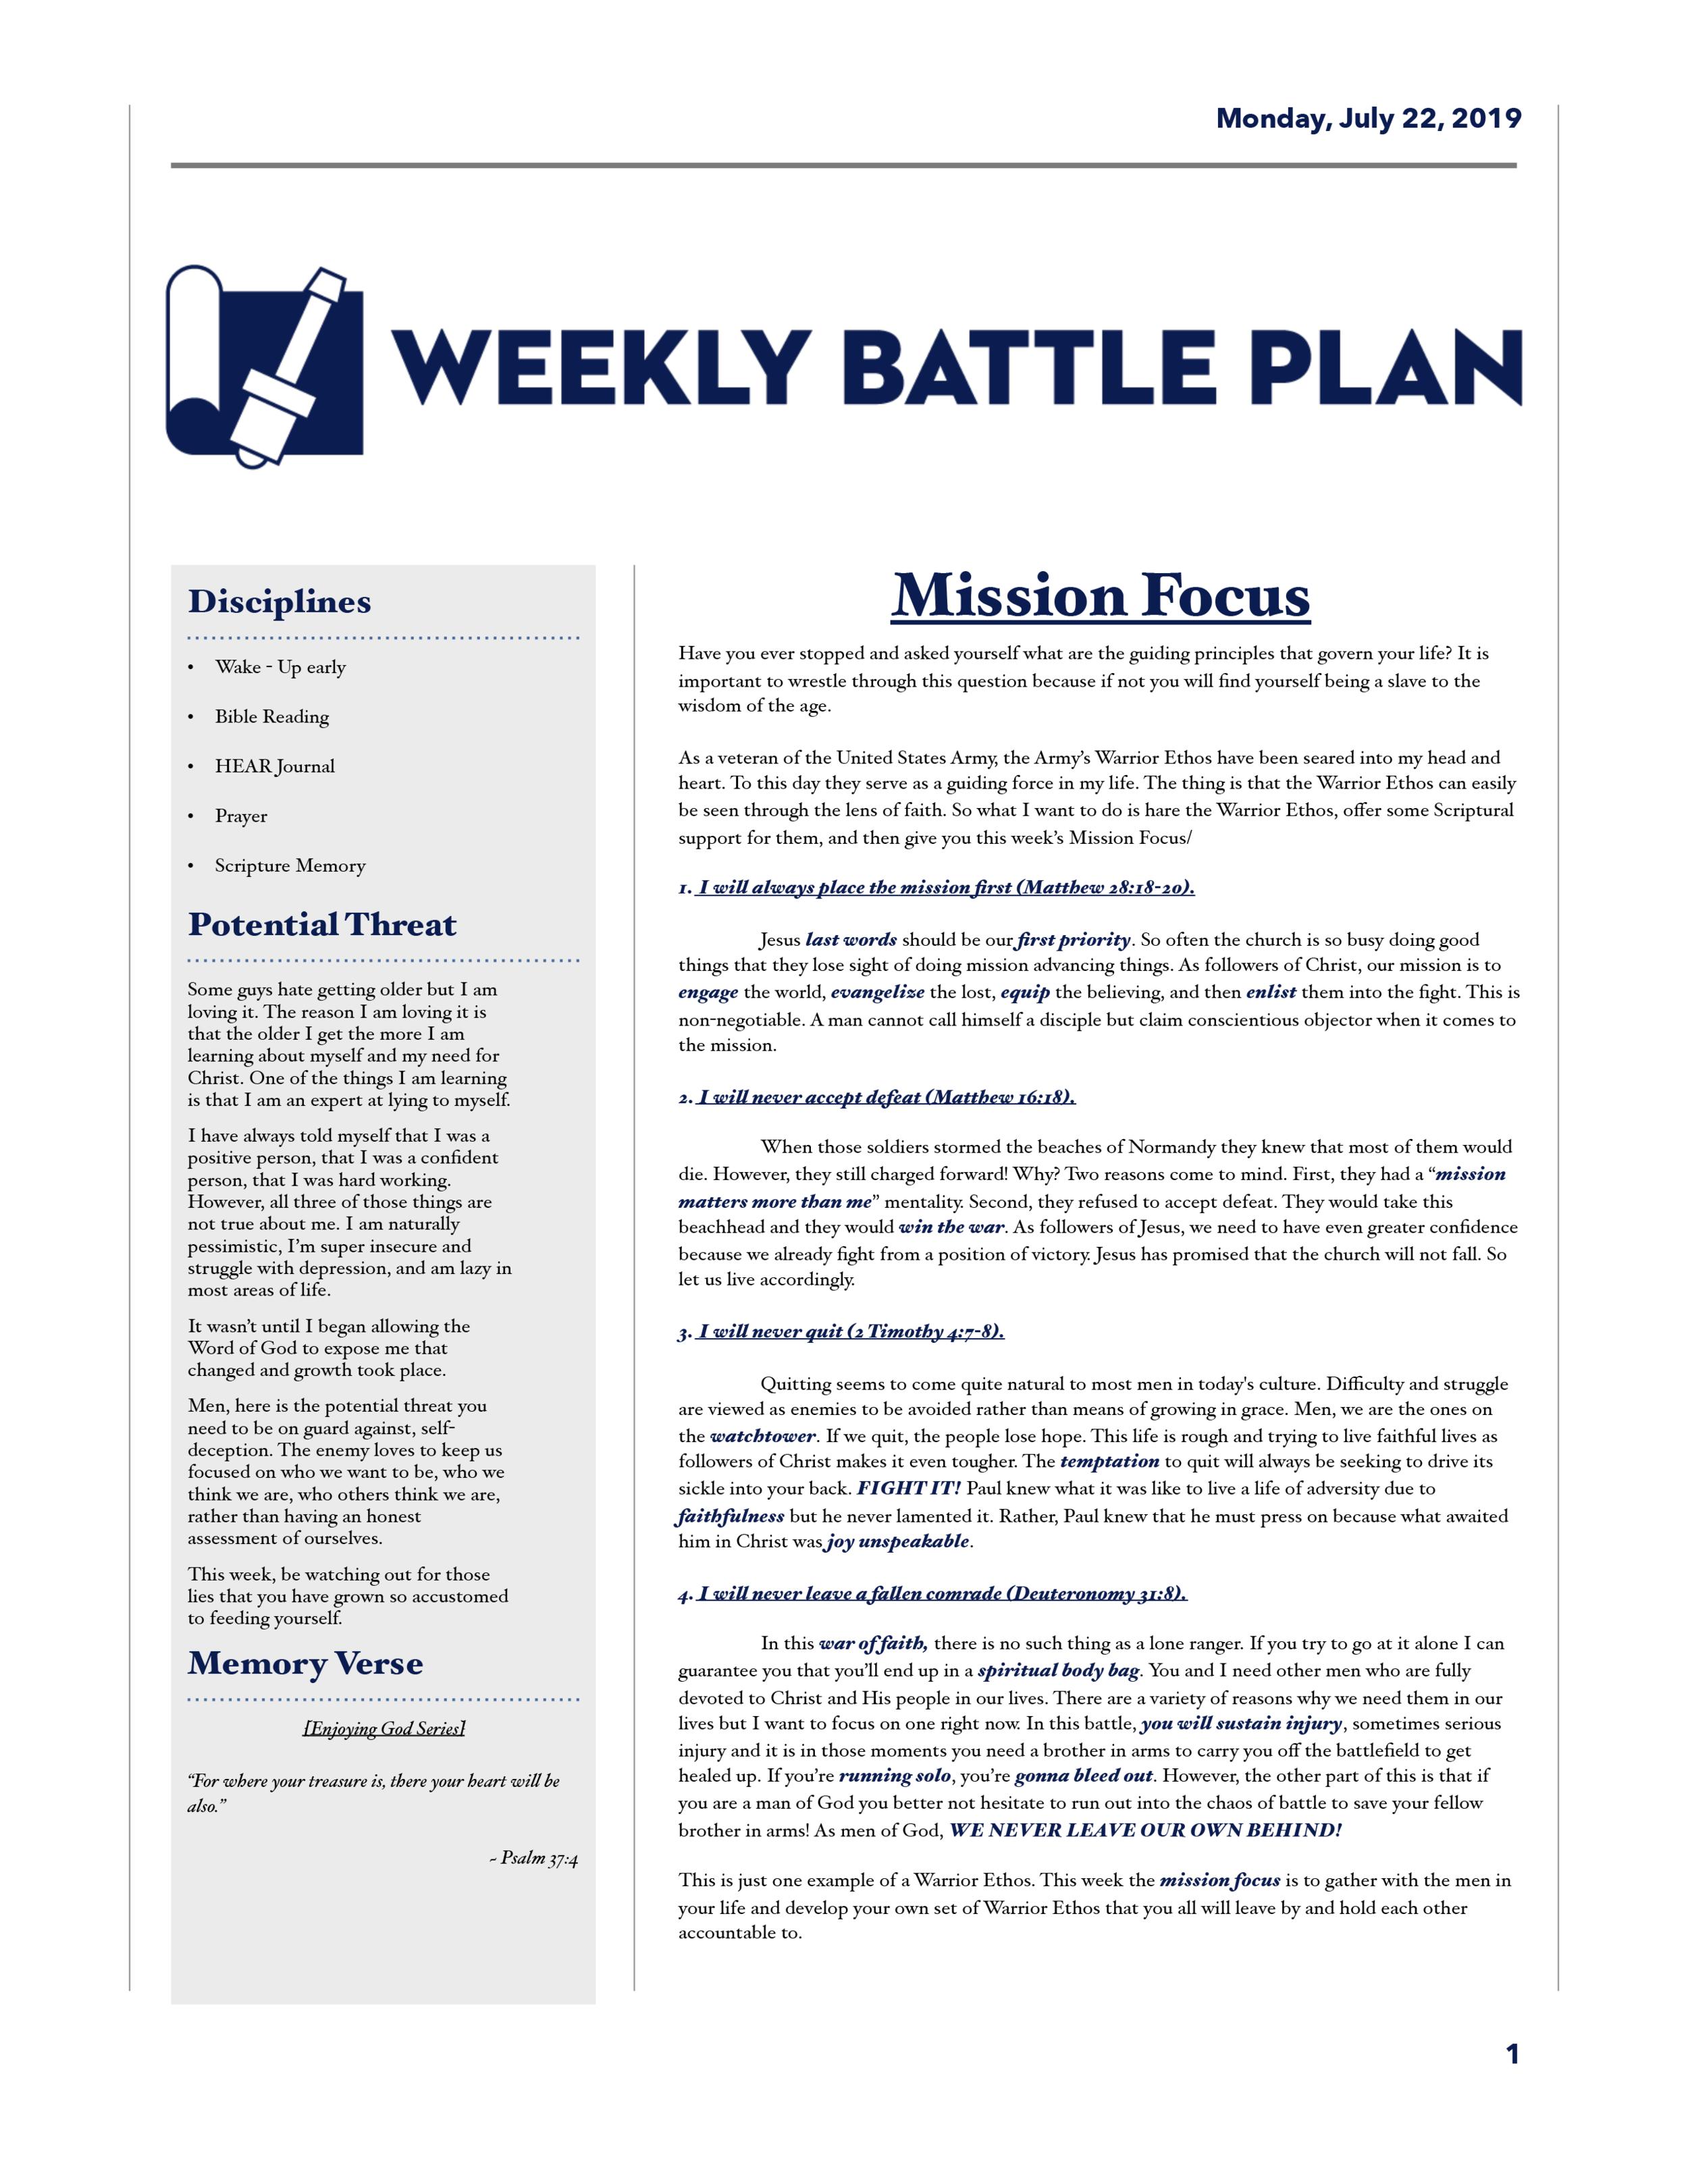 Battle Plan 7.22 -1.png